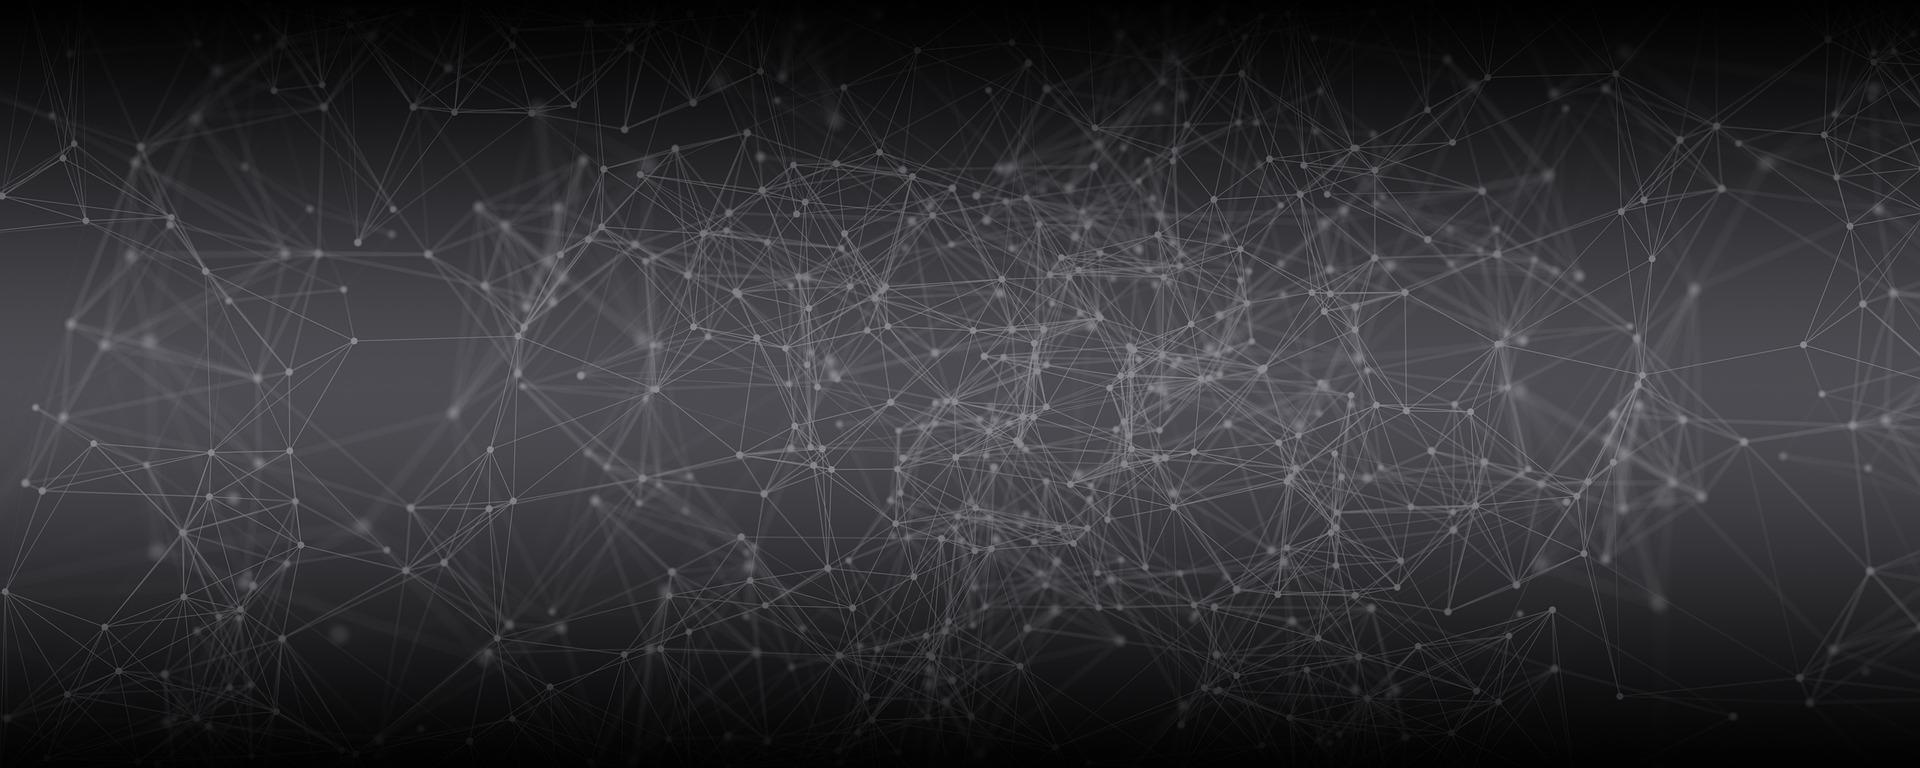 network-4559220_1920